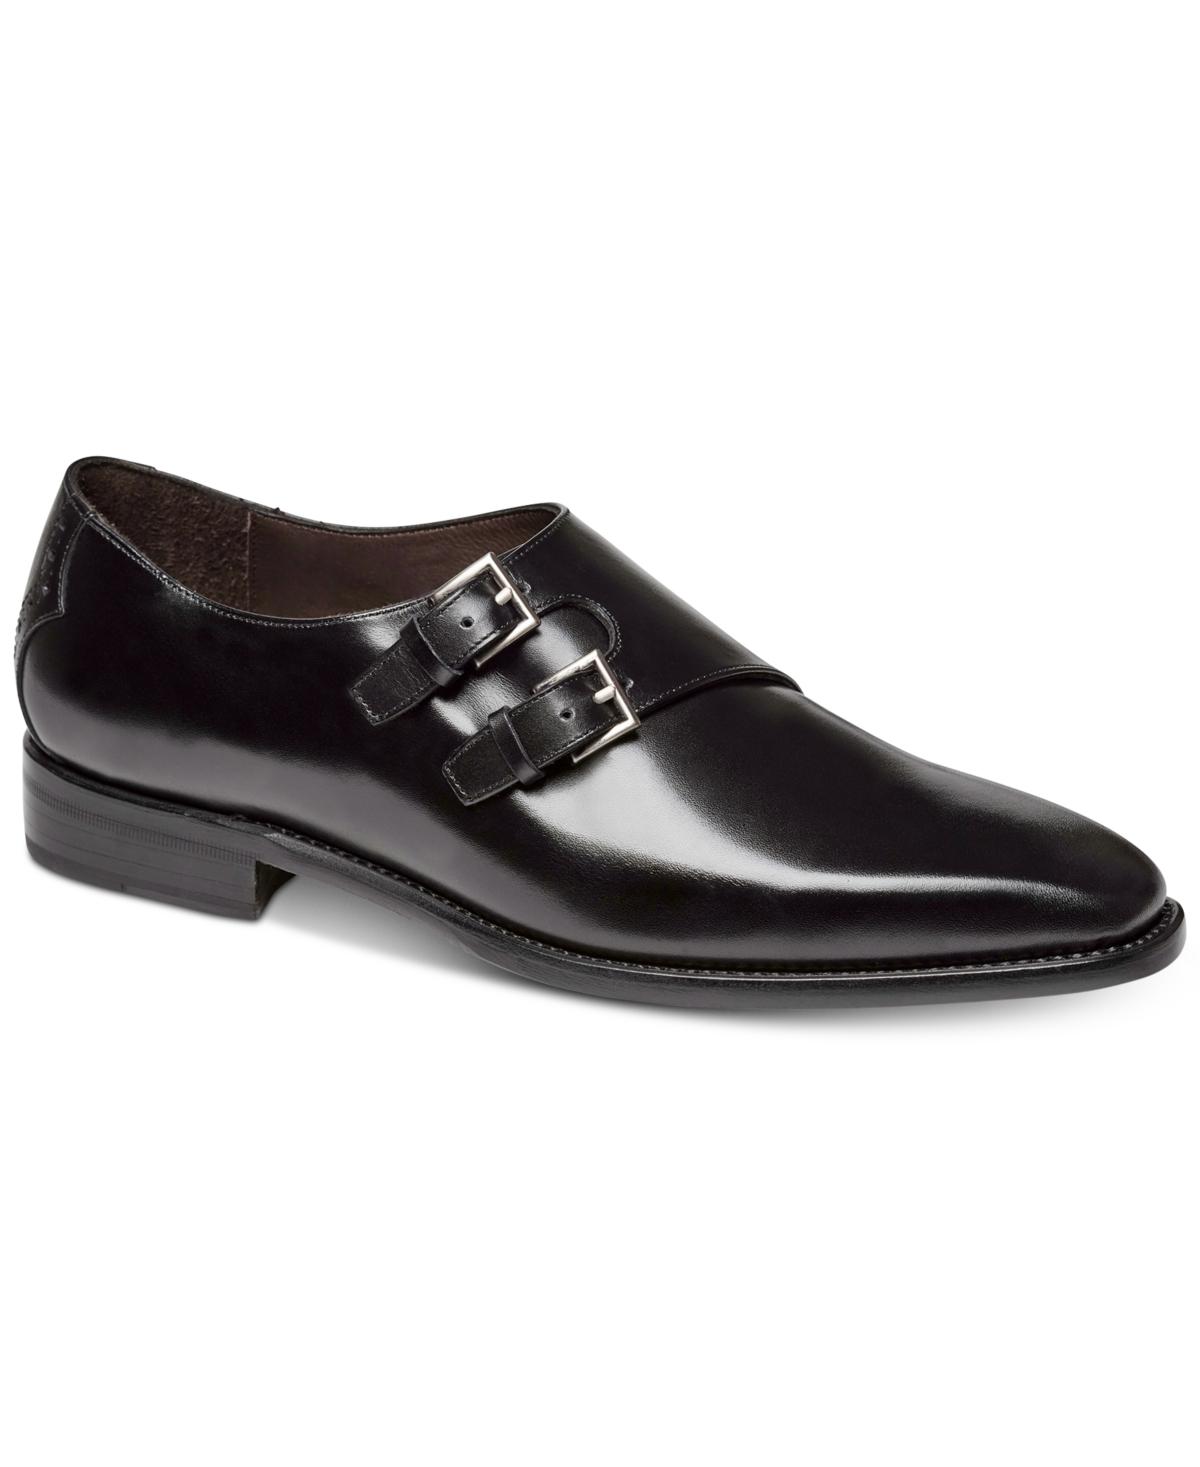 Carlos by Carlos Santana Power Print Men's Oxford Shoe Men's Shoes